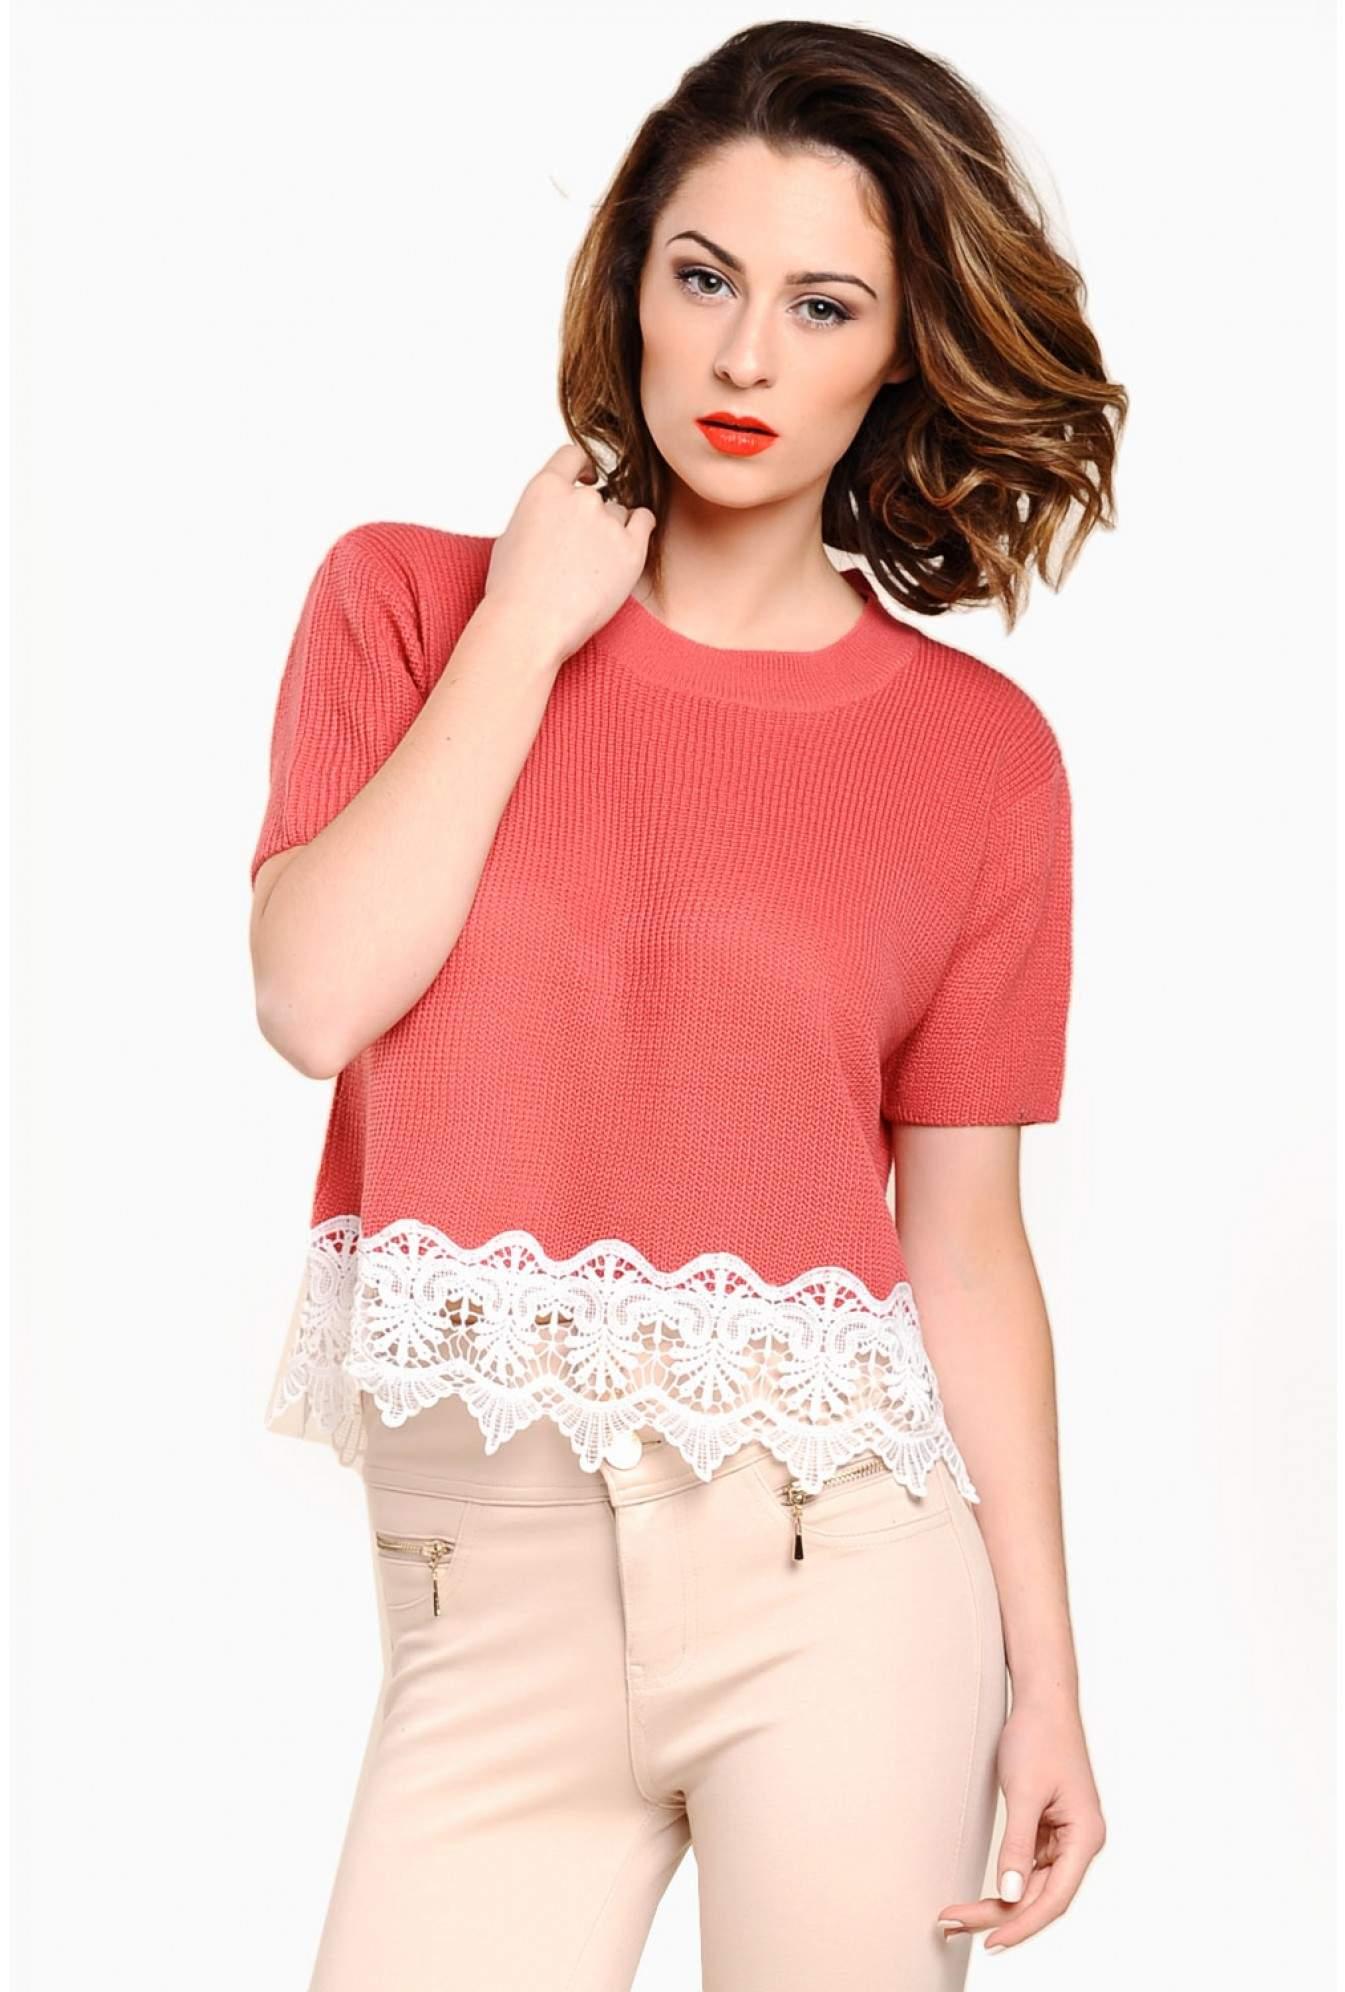 bc19e016a09 Stella Blair Crochet Hem Knit Crop Top in Pink | iCLOTHING